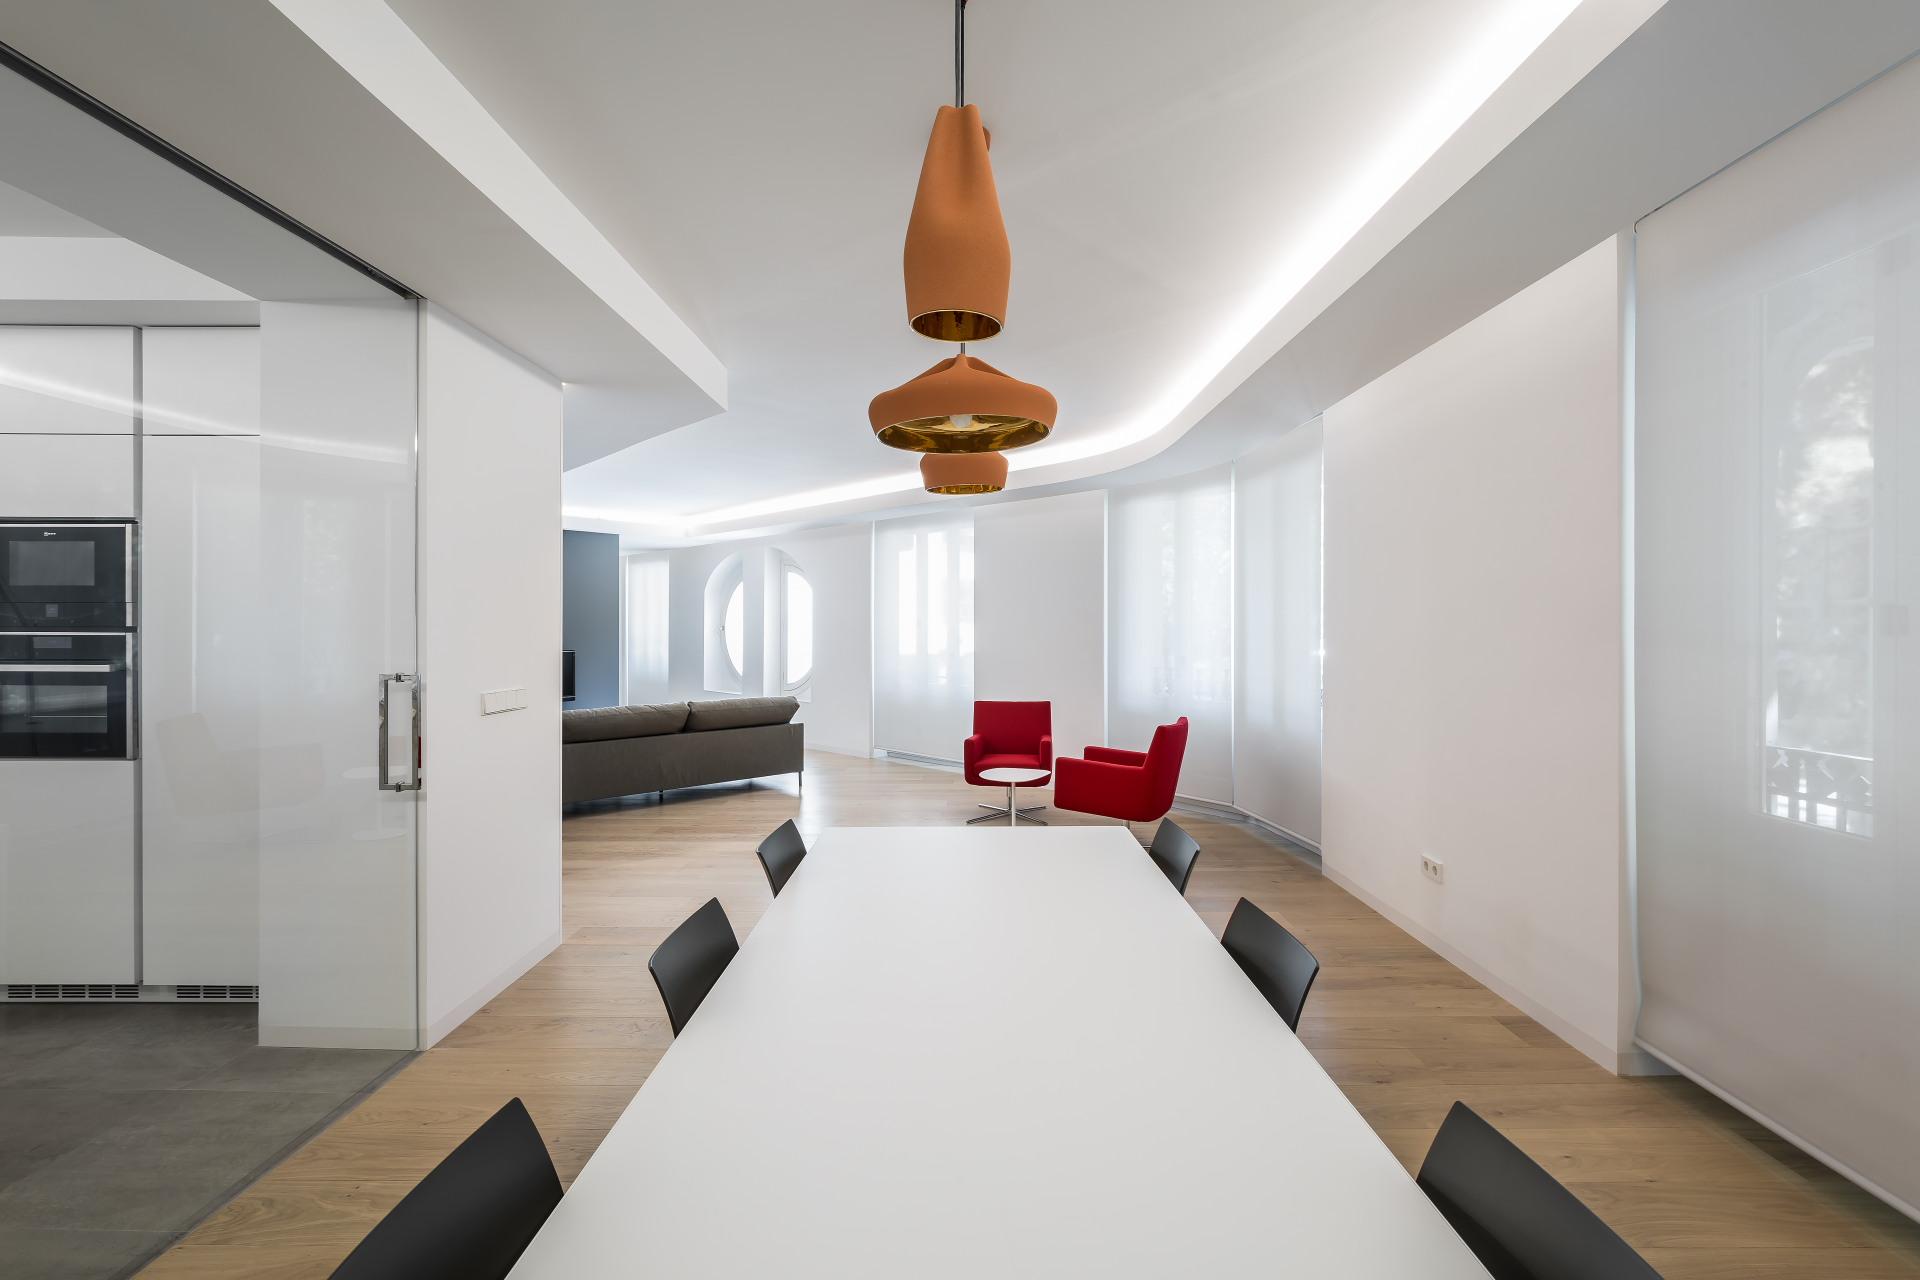 fotografia-arquitectura-interiorismo-valencia-german-cabo-gallardo-llopis-bfm-edificatoria-turia02 (8)